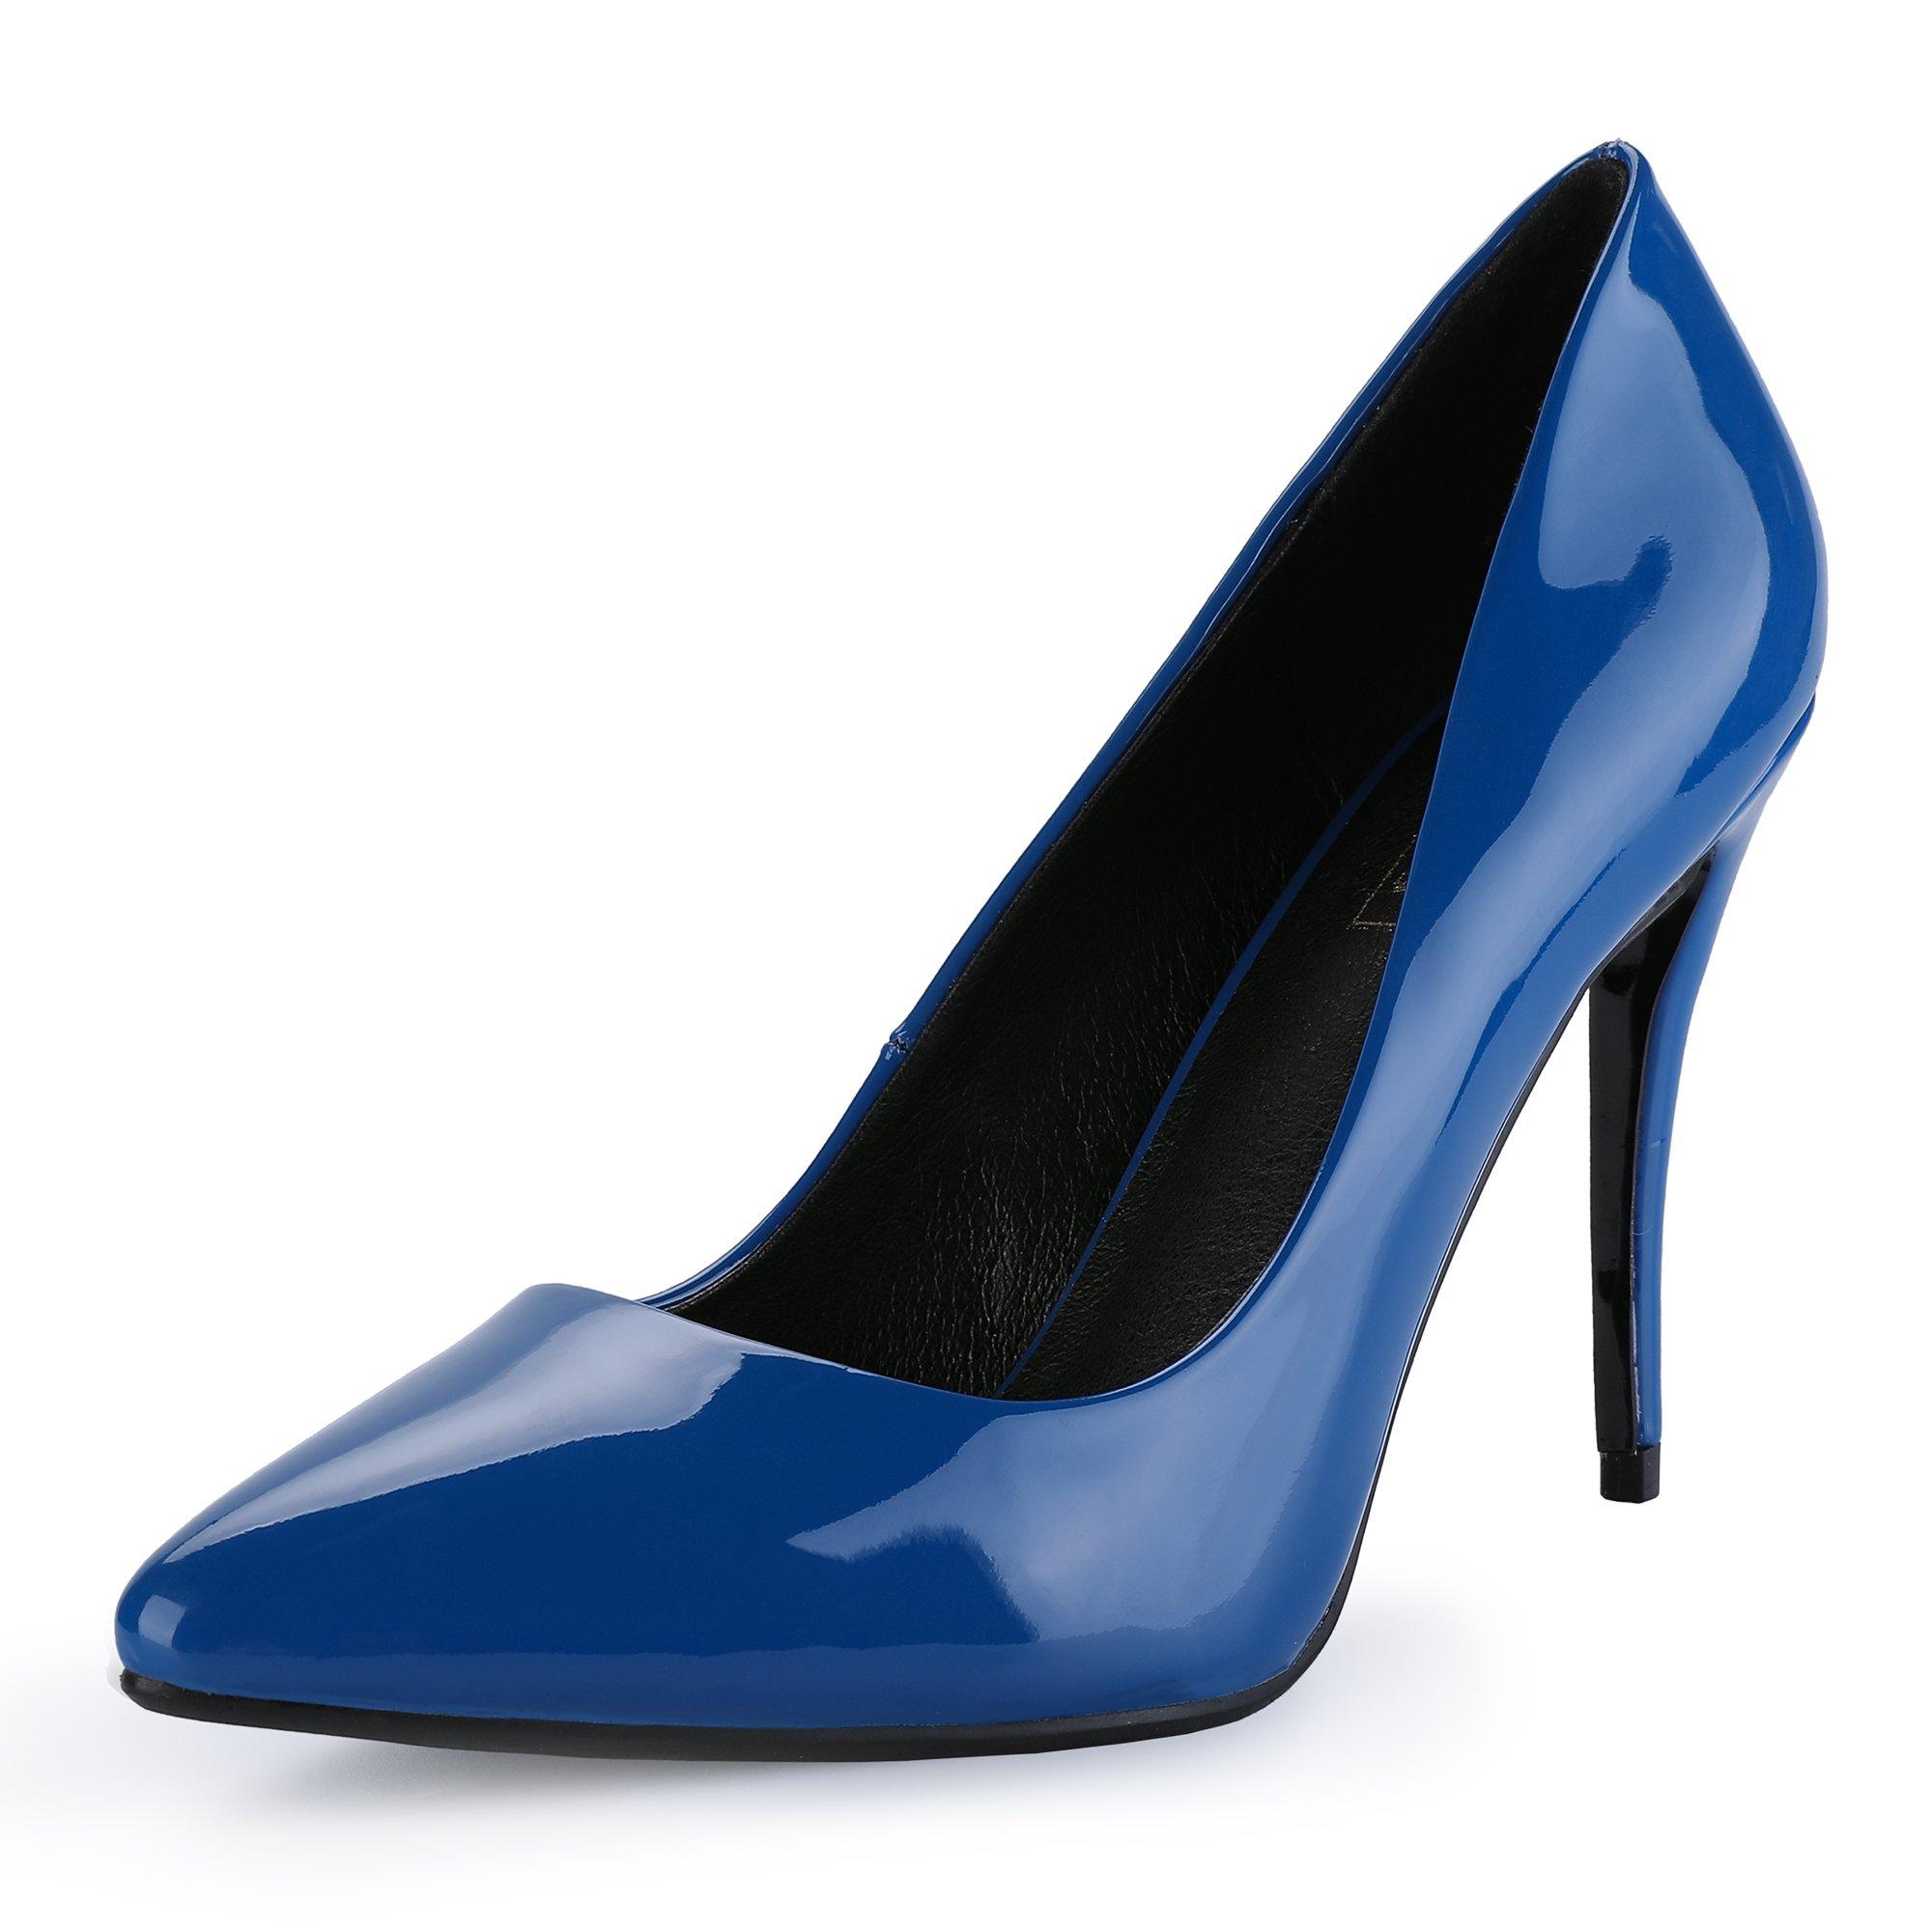 IDIFU Women's IN4 Classic Pointed Toe Stiletto High Heel Dress Pump (8.5 B(M) US, Blue Patent)